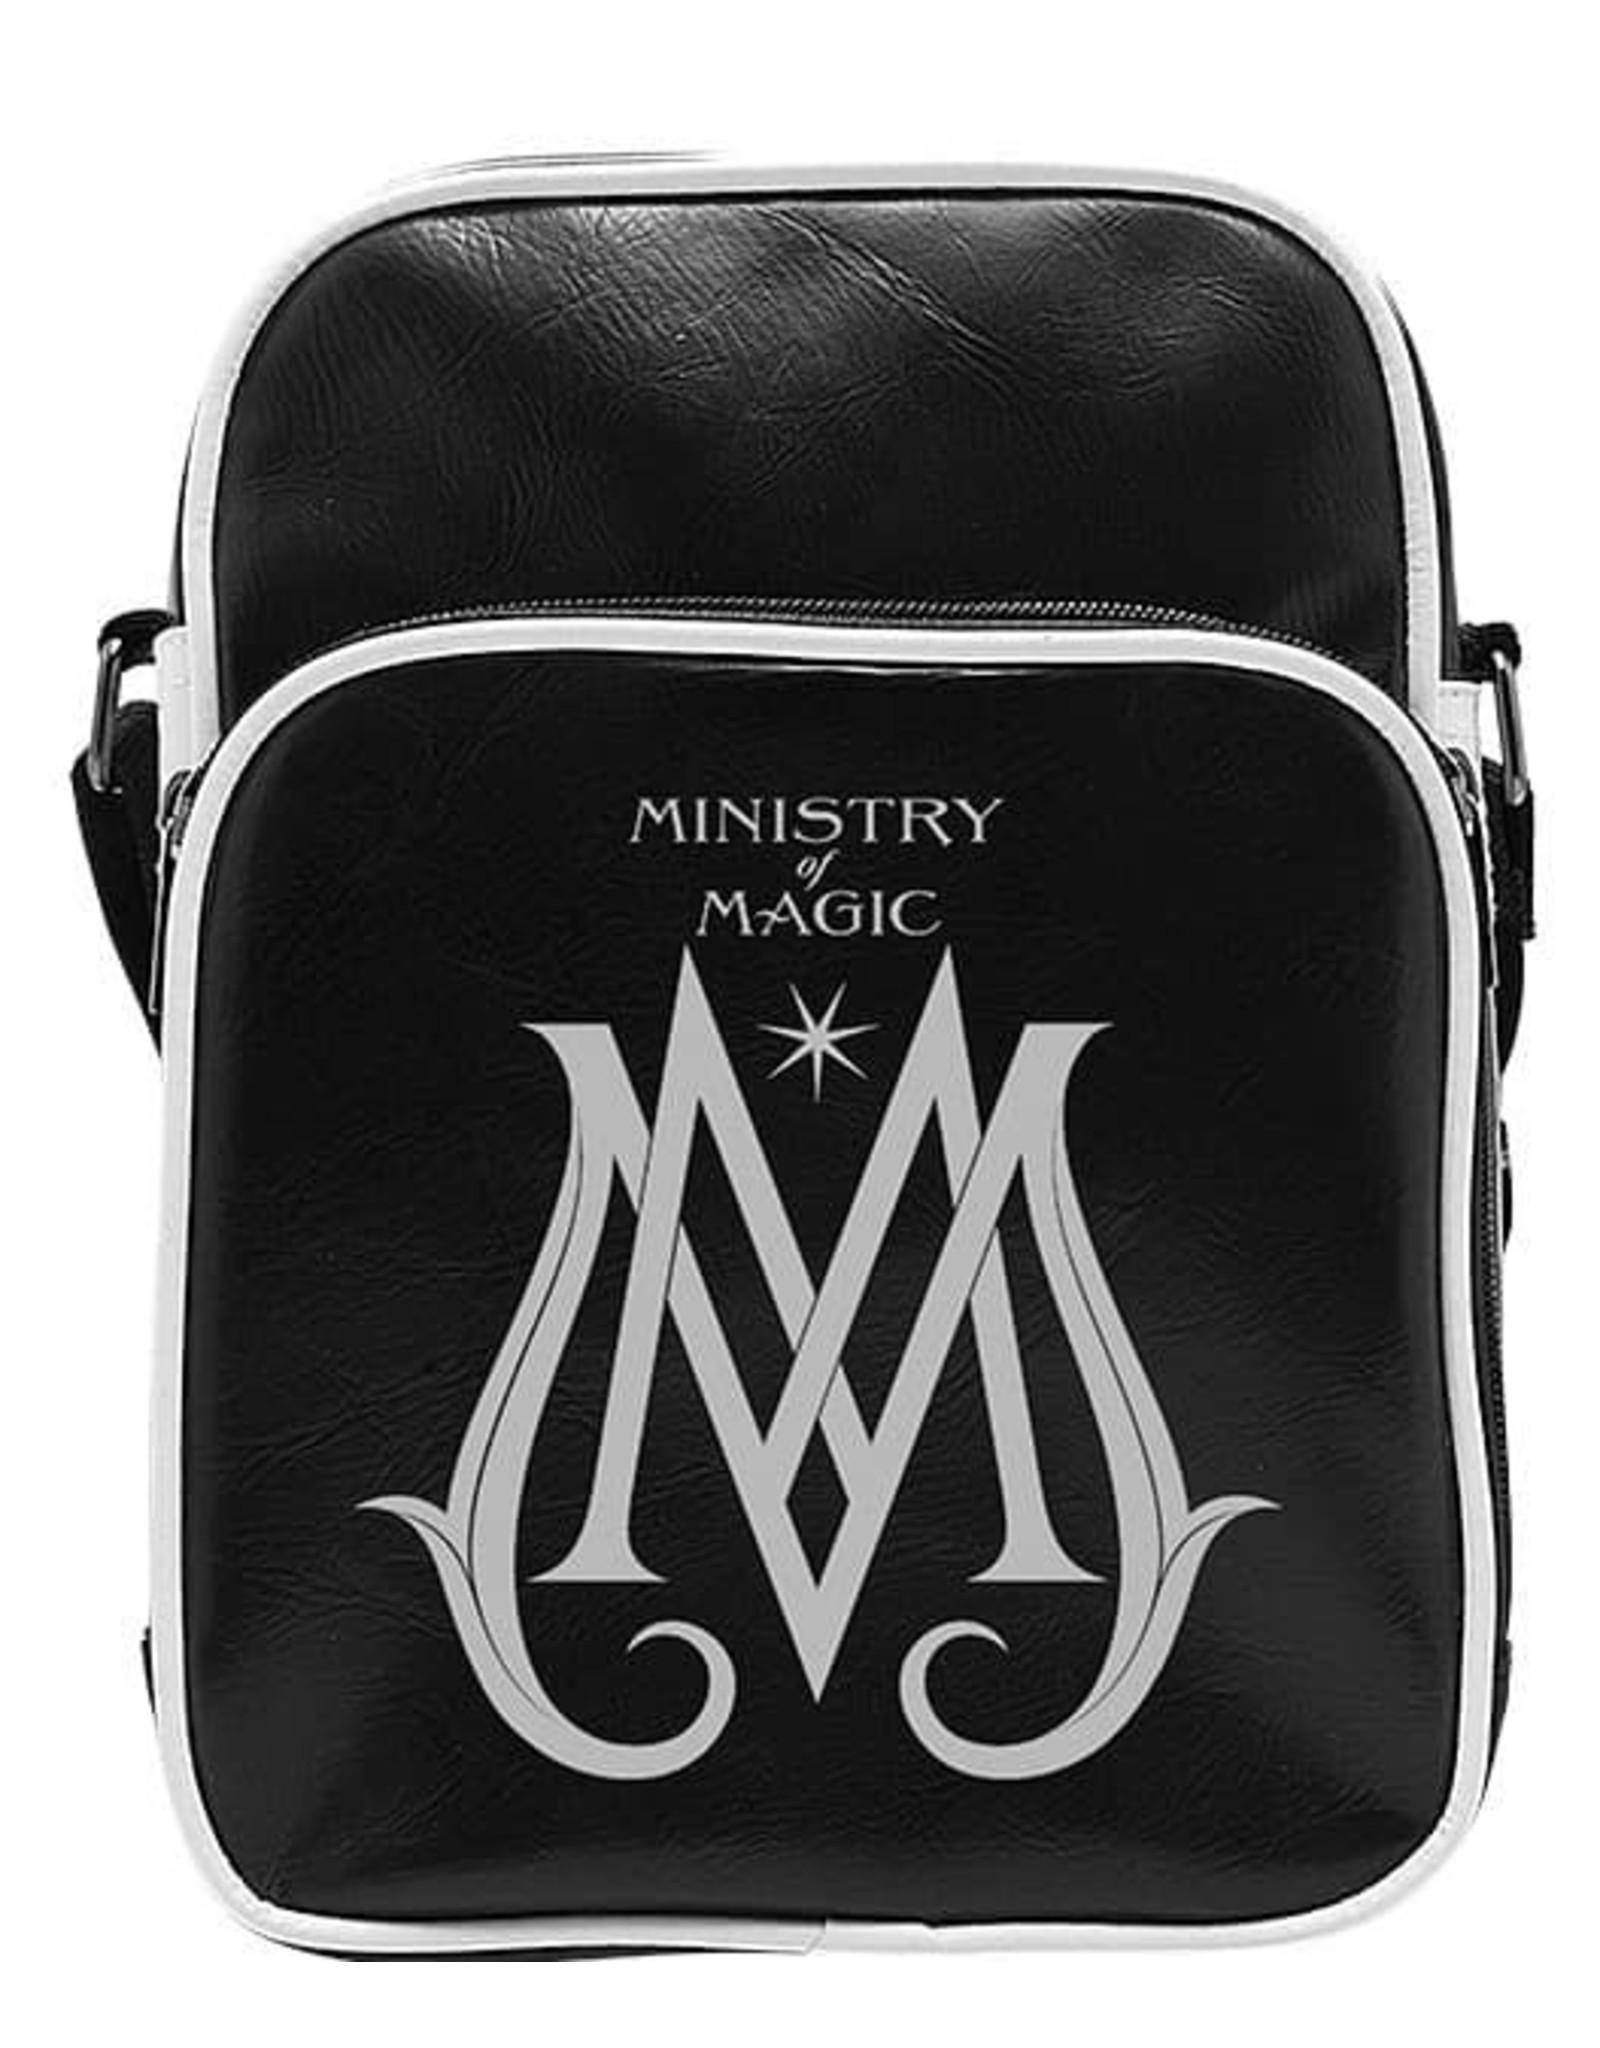 Fantastic Beasts Merchandise bags - Fantastic Beasts Ministry shoulder bag